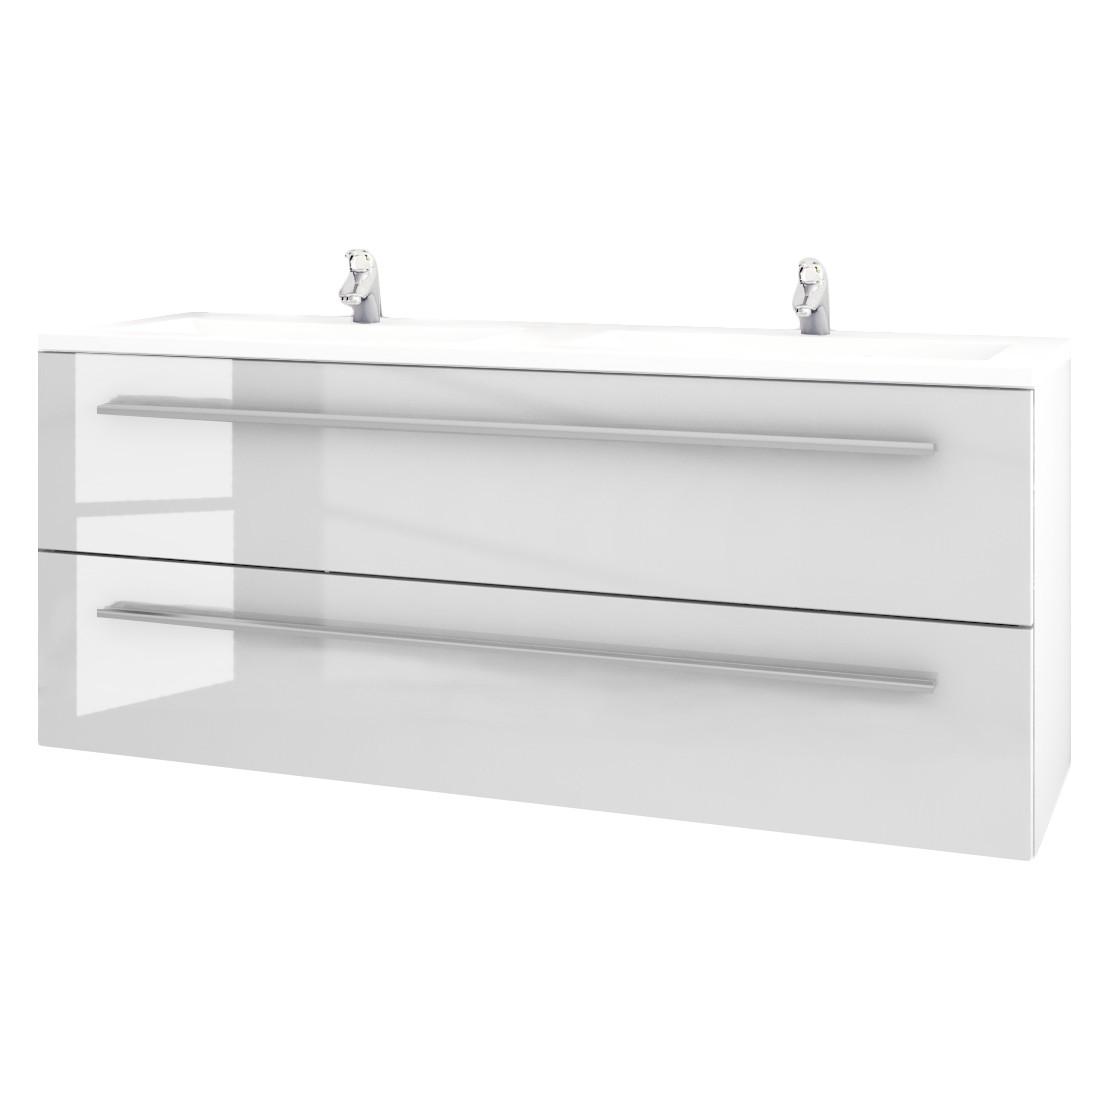 Home 24 - Double lavabo lagarto - blanc - 120 cm, sieper